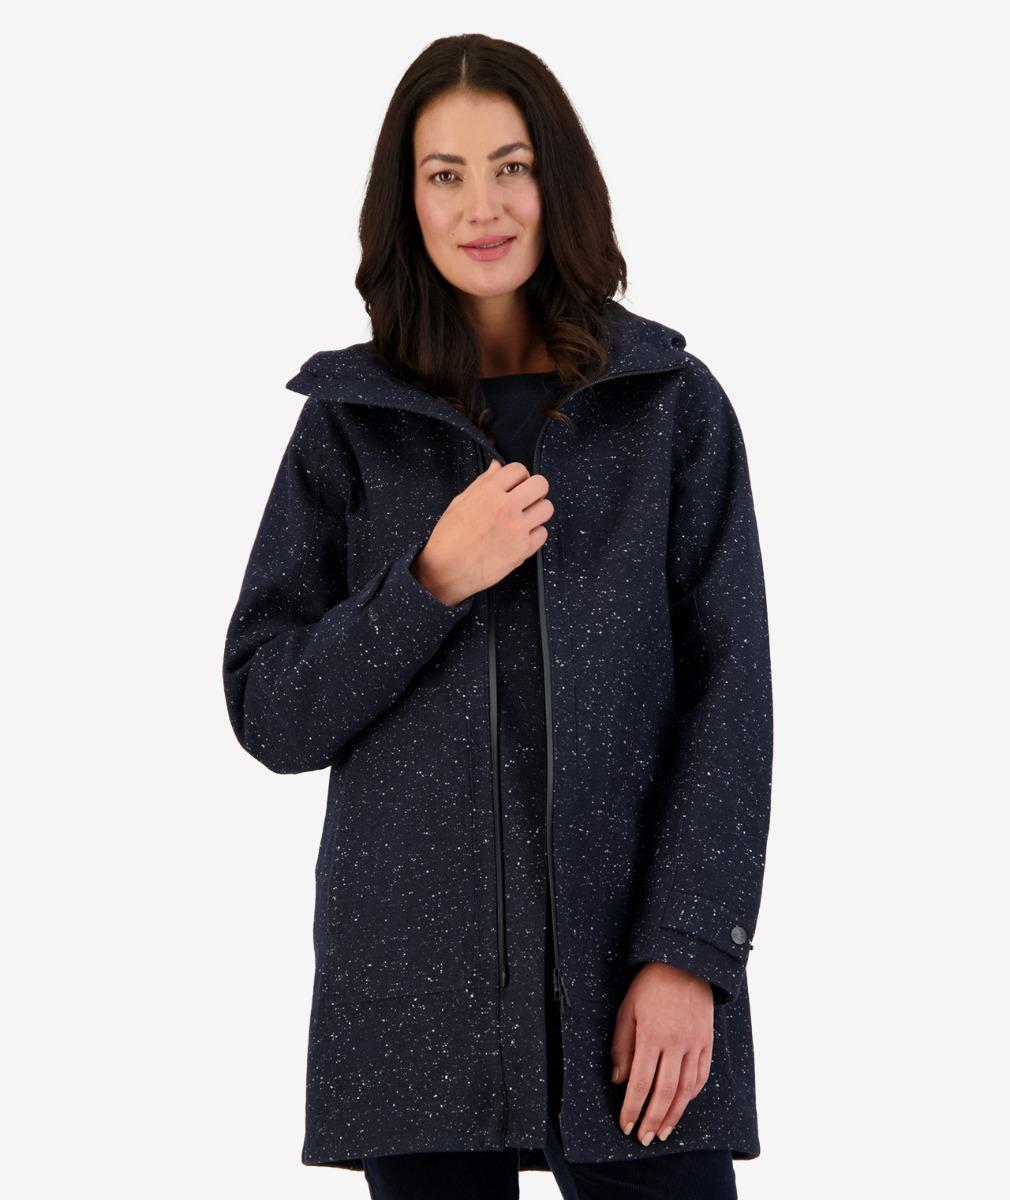 Swanndri Milford Jacket V2 in Charcoal Tweed